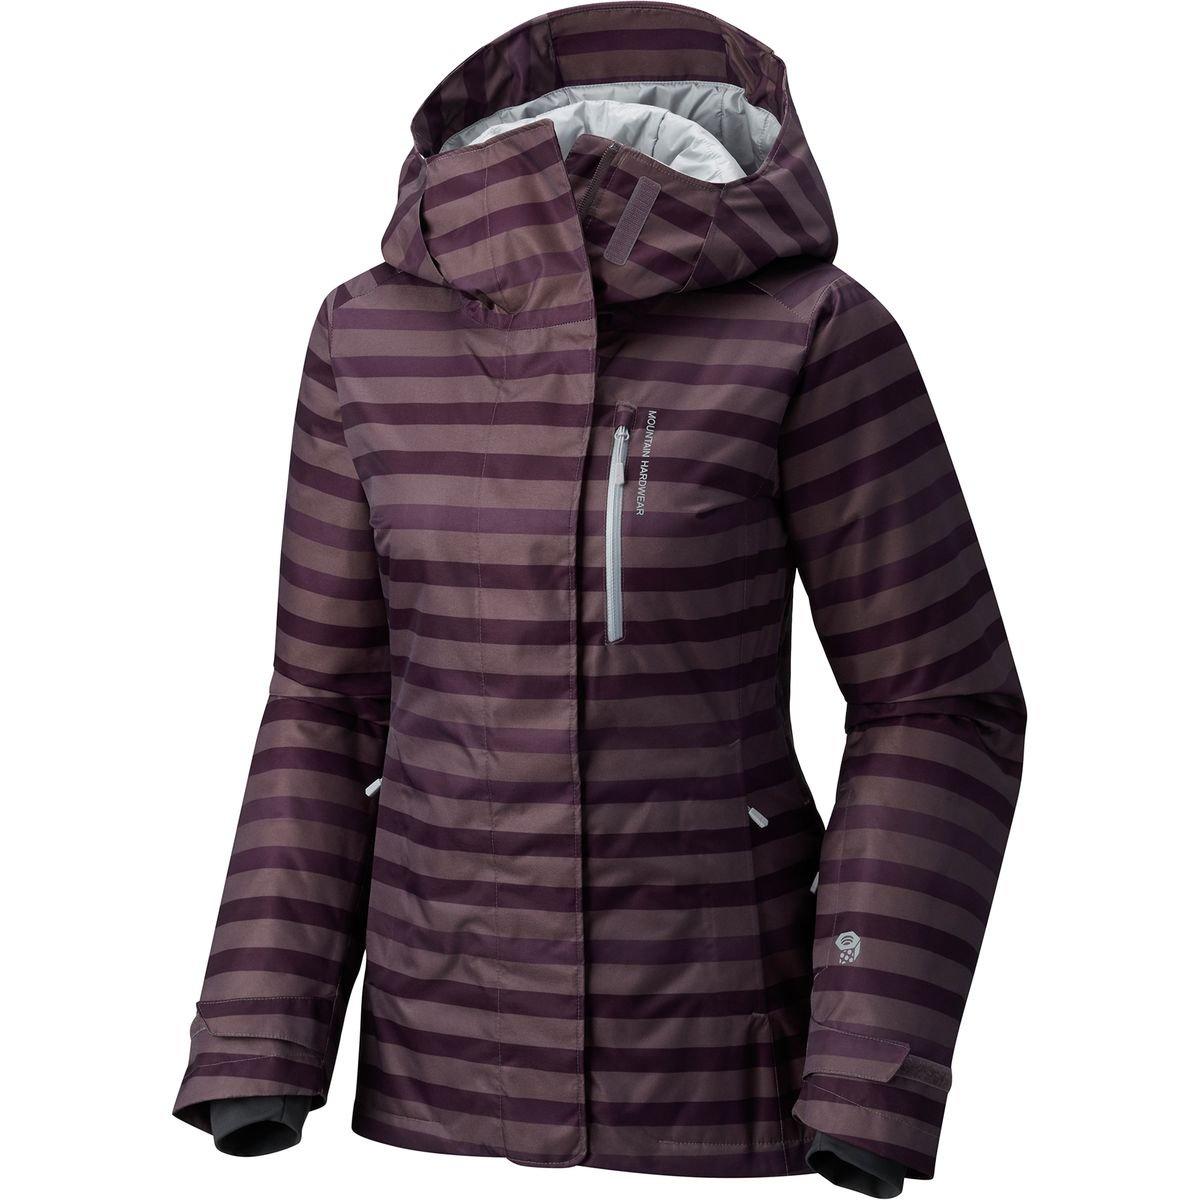 Mountain Hardwear barnsie Jacket – Women 's B01MXM7TGR X-Small|Purple Sage Purple Sage X-Small